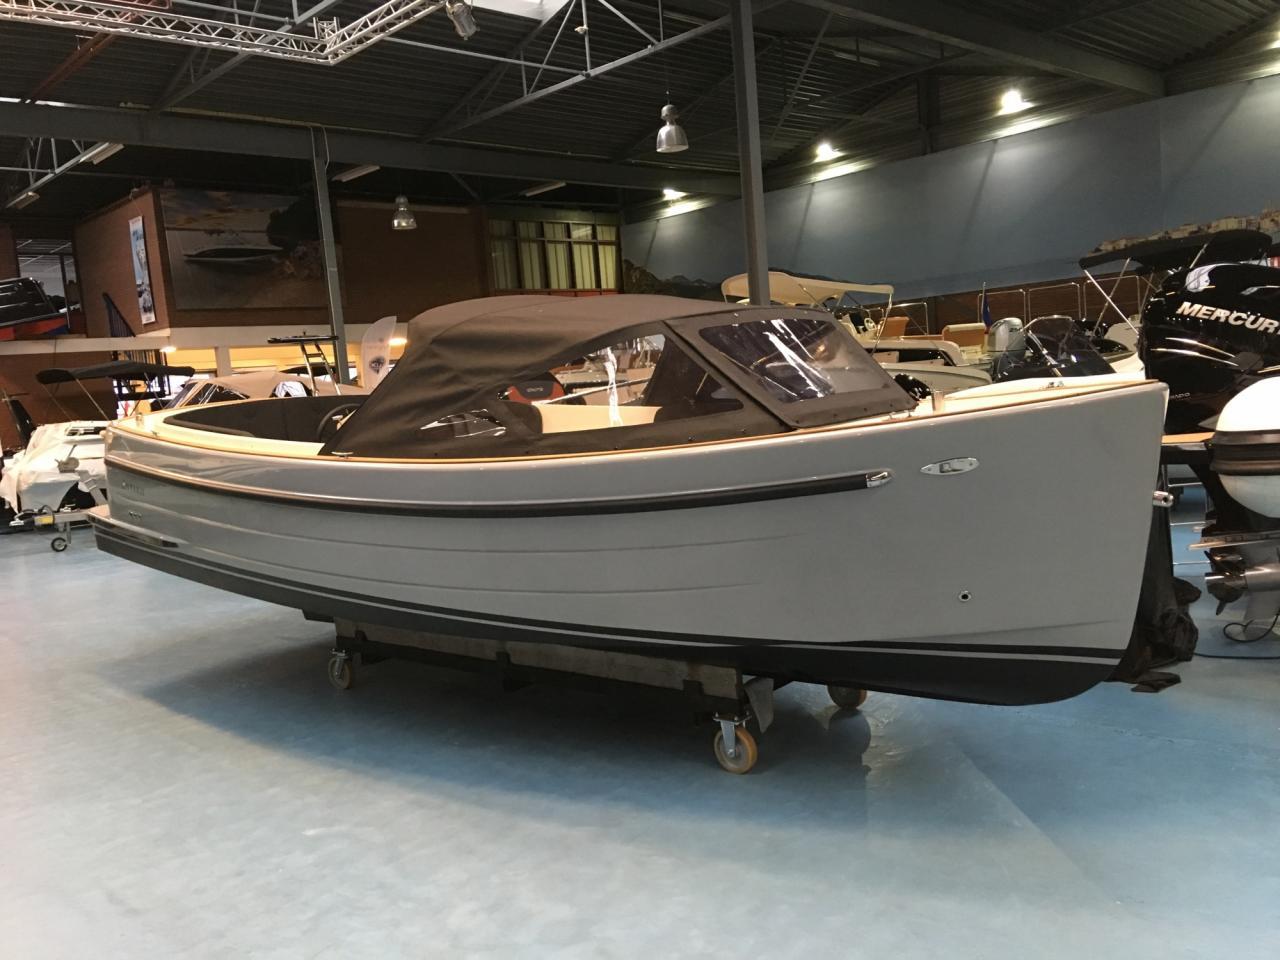 Antaris sixty6 grijs met 42 pk Vetus 4